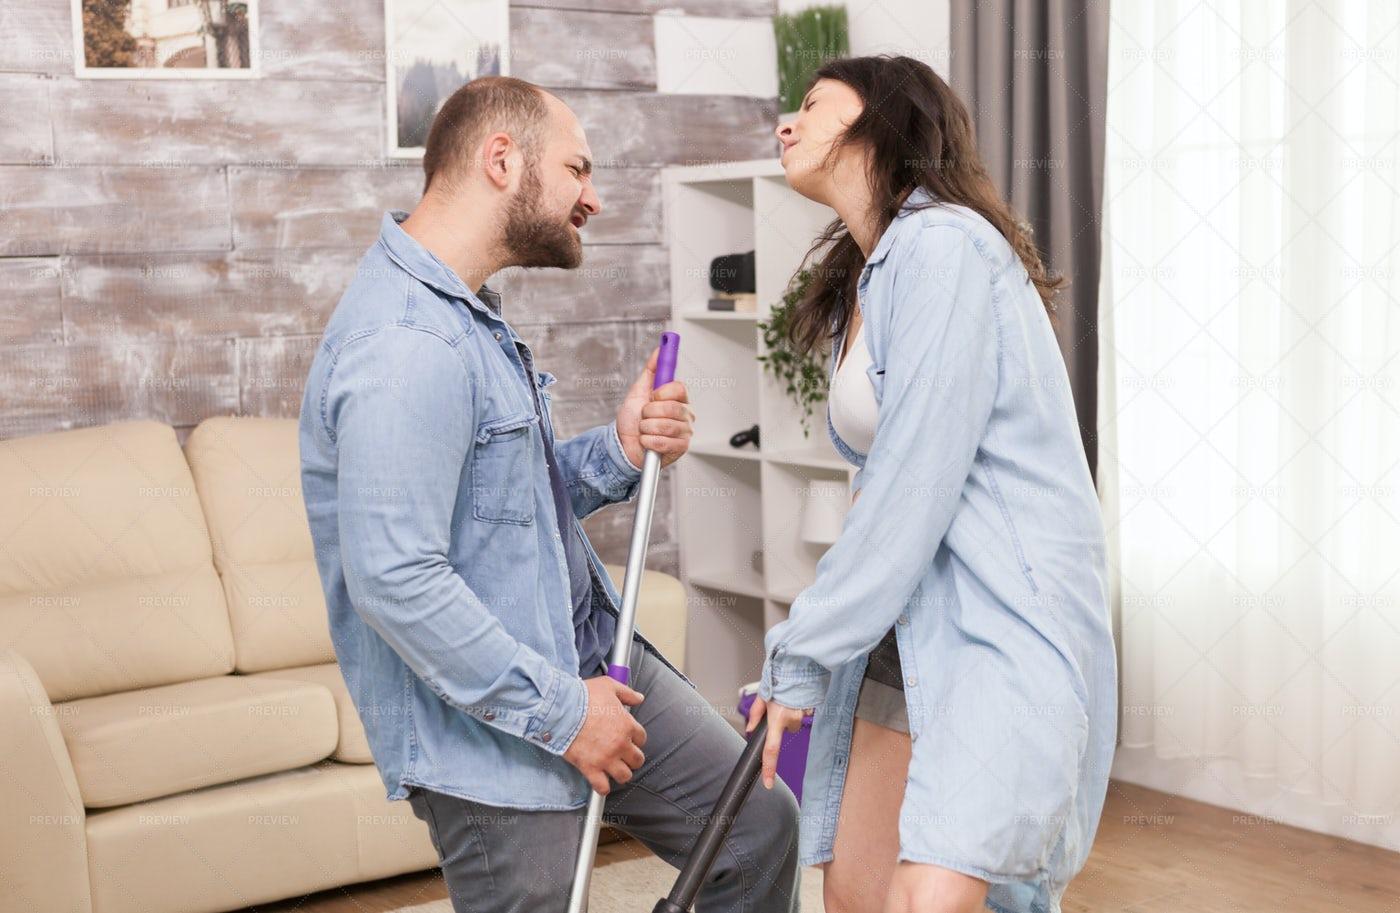 Singing And Housekeeping: Stock Photos